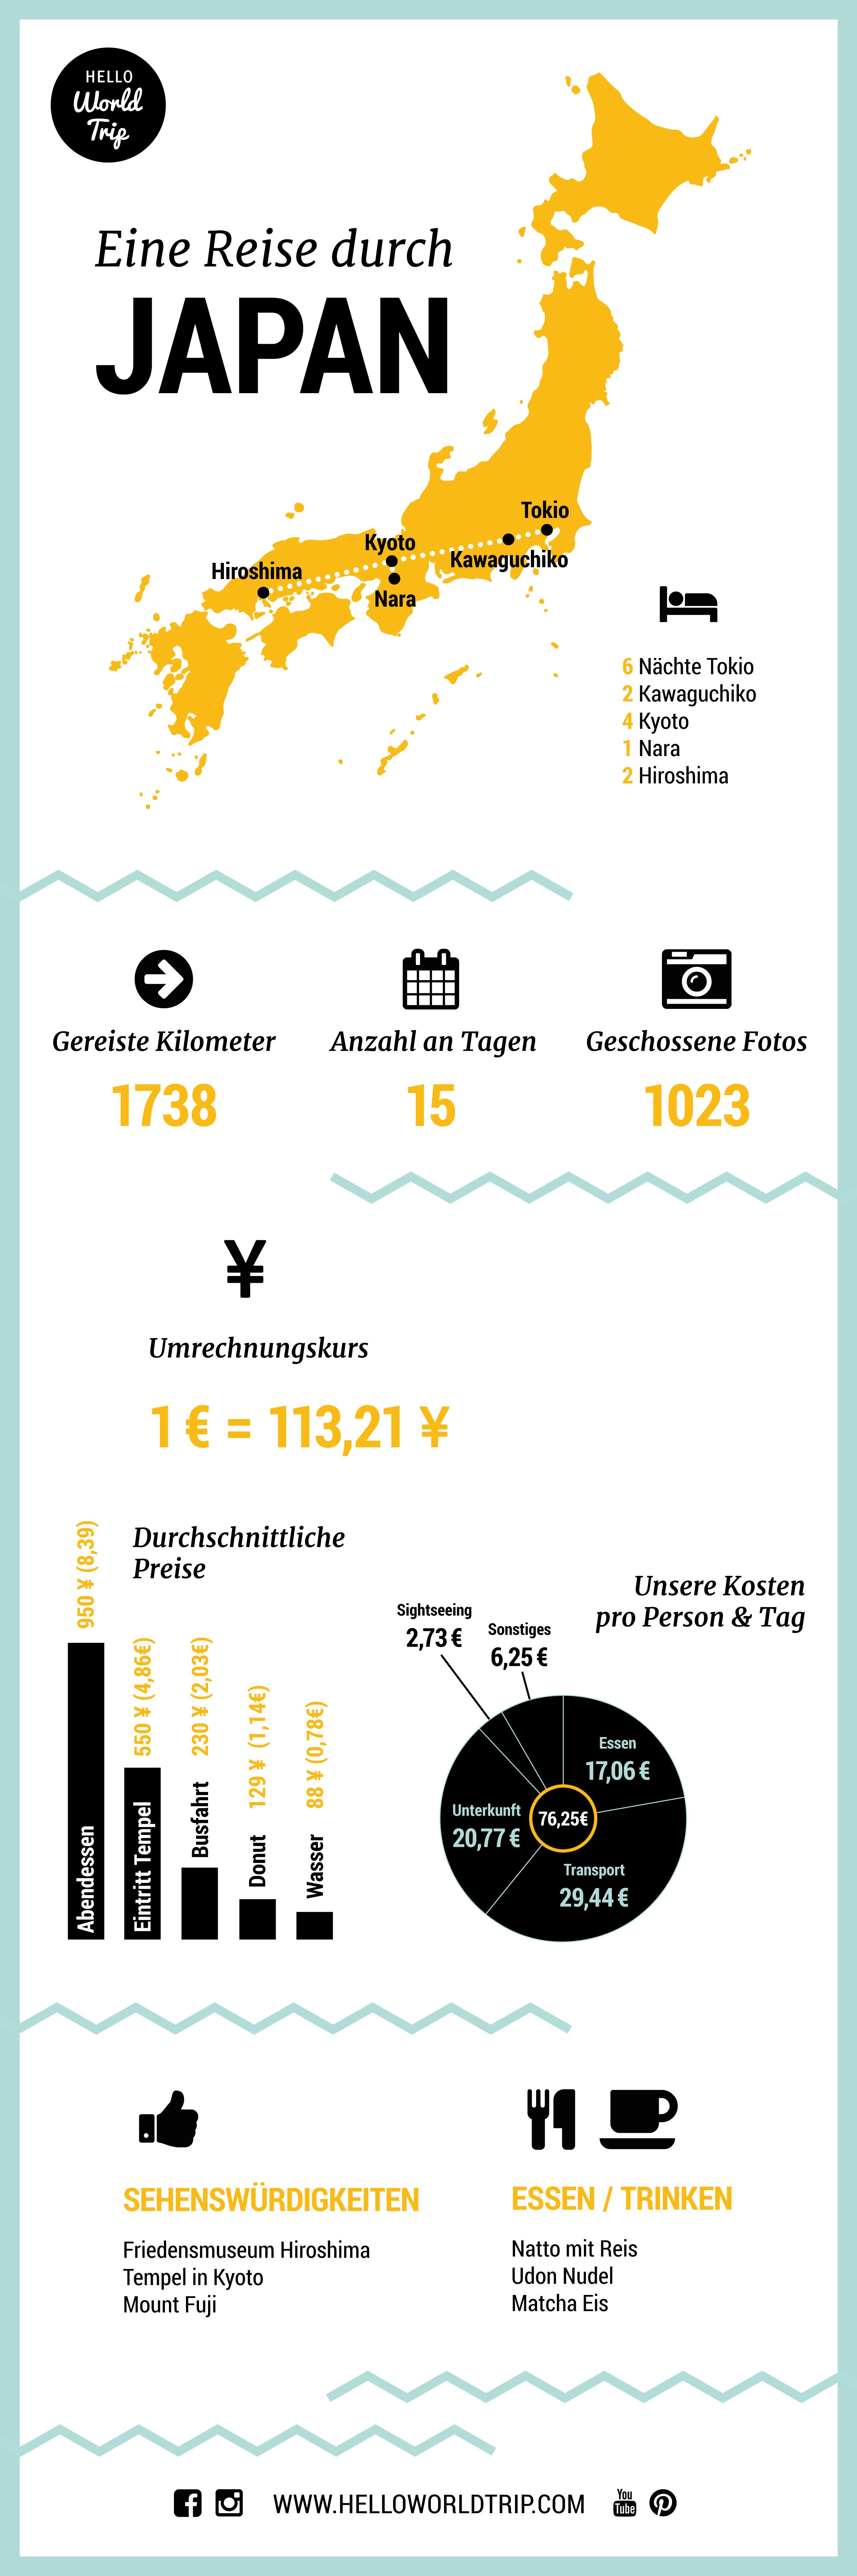 Infografik Eine Reise Durch Japan Japan Reisen Infografik Reisen